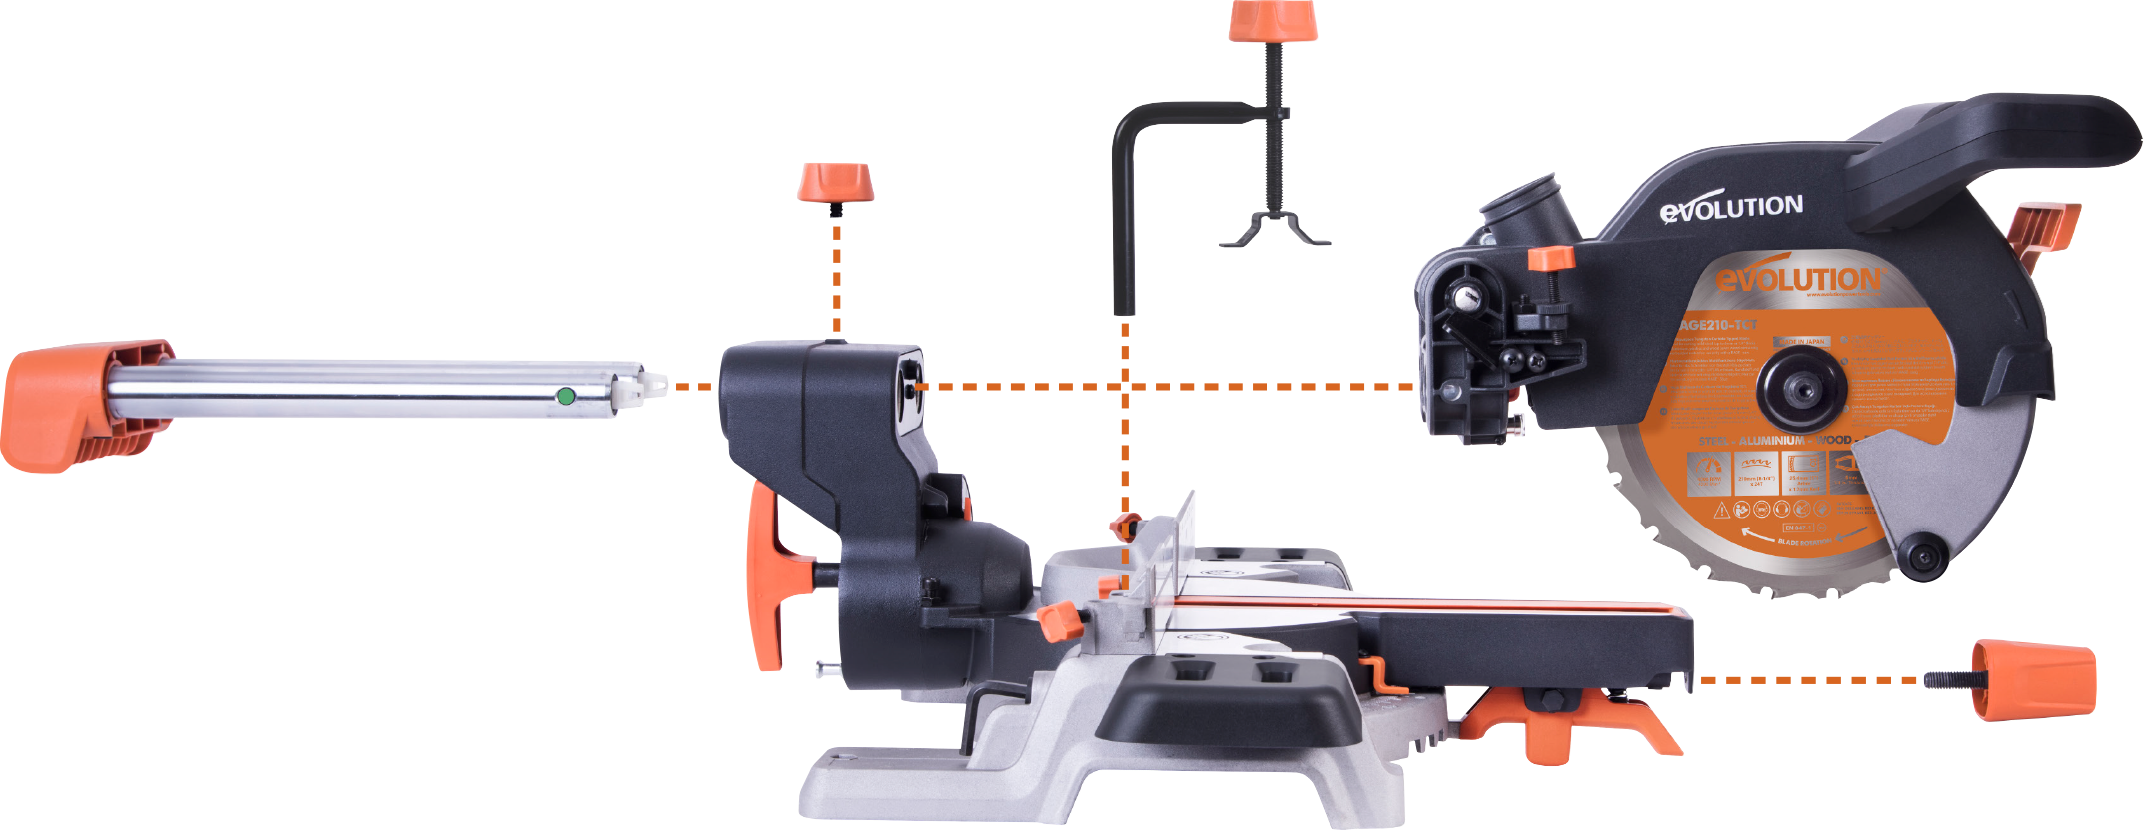 Evolution R210sms Multi Purpose 210mm Sliding Mitre Saw